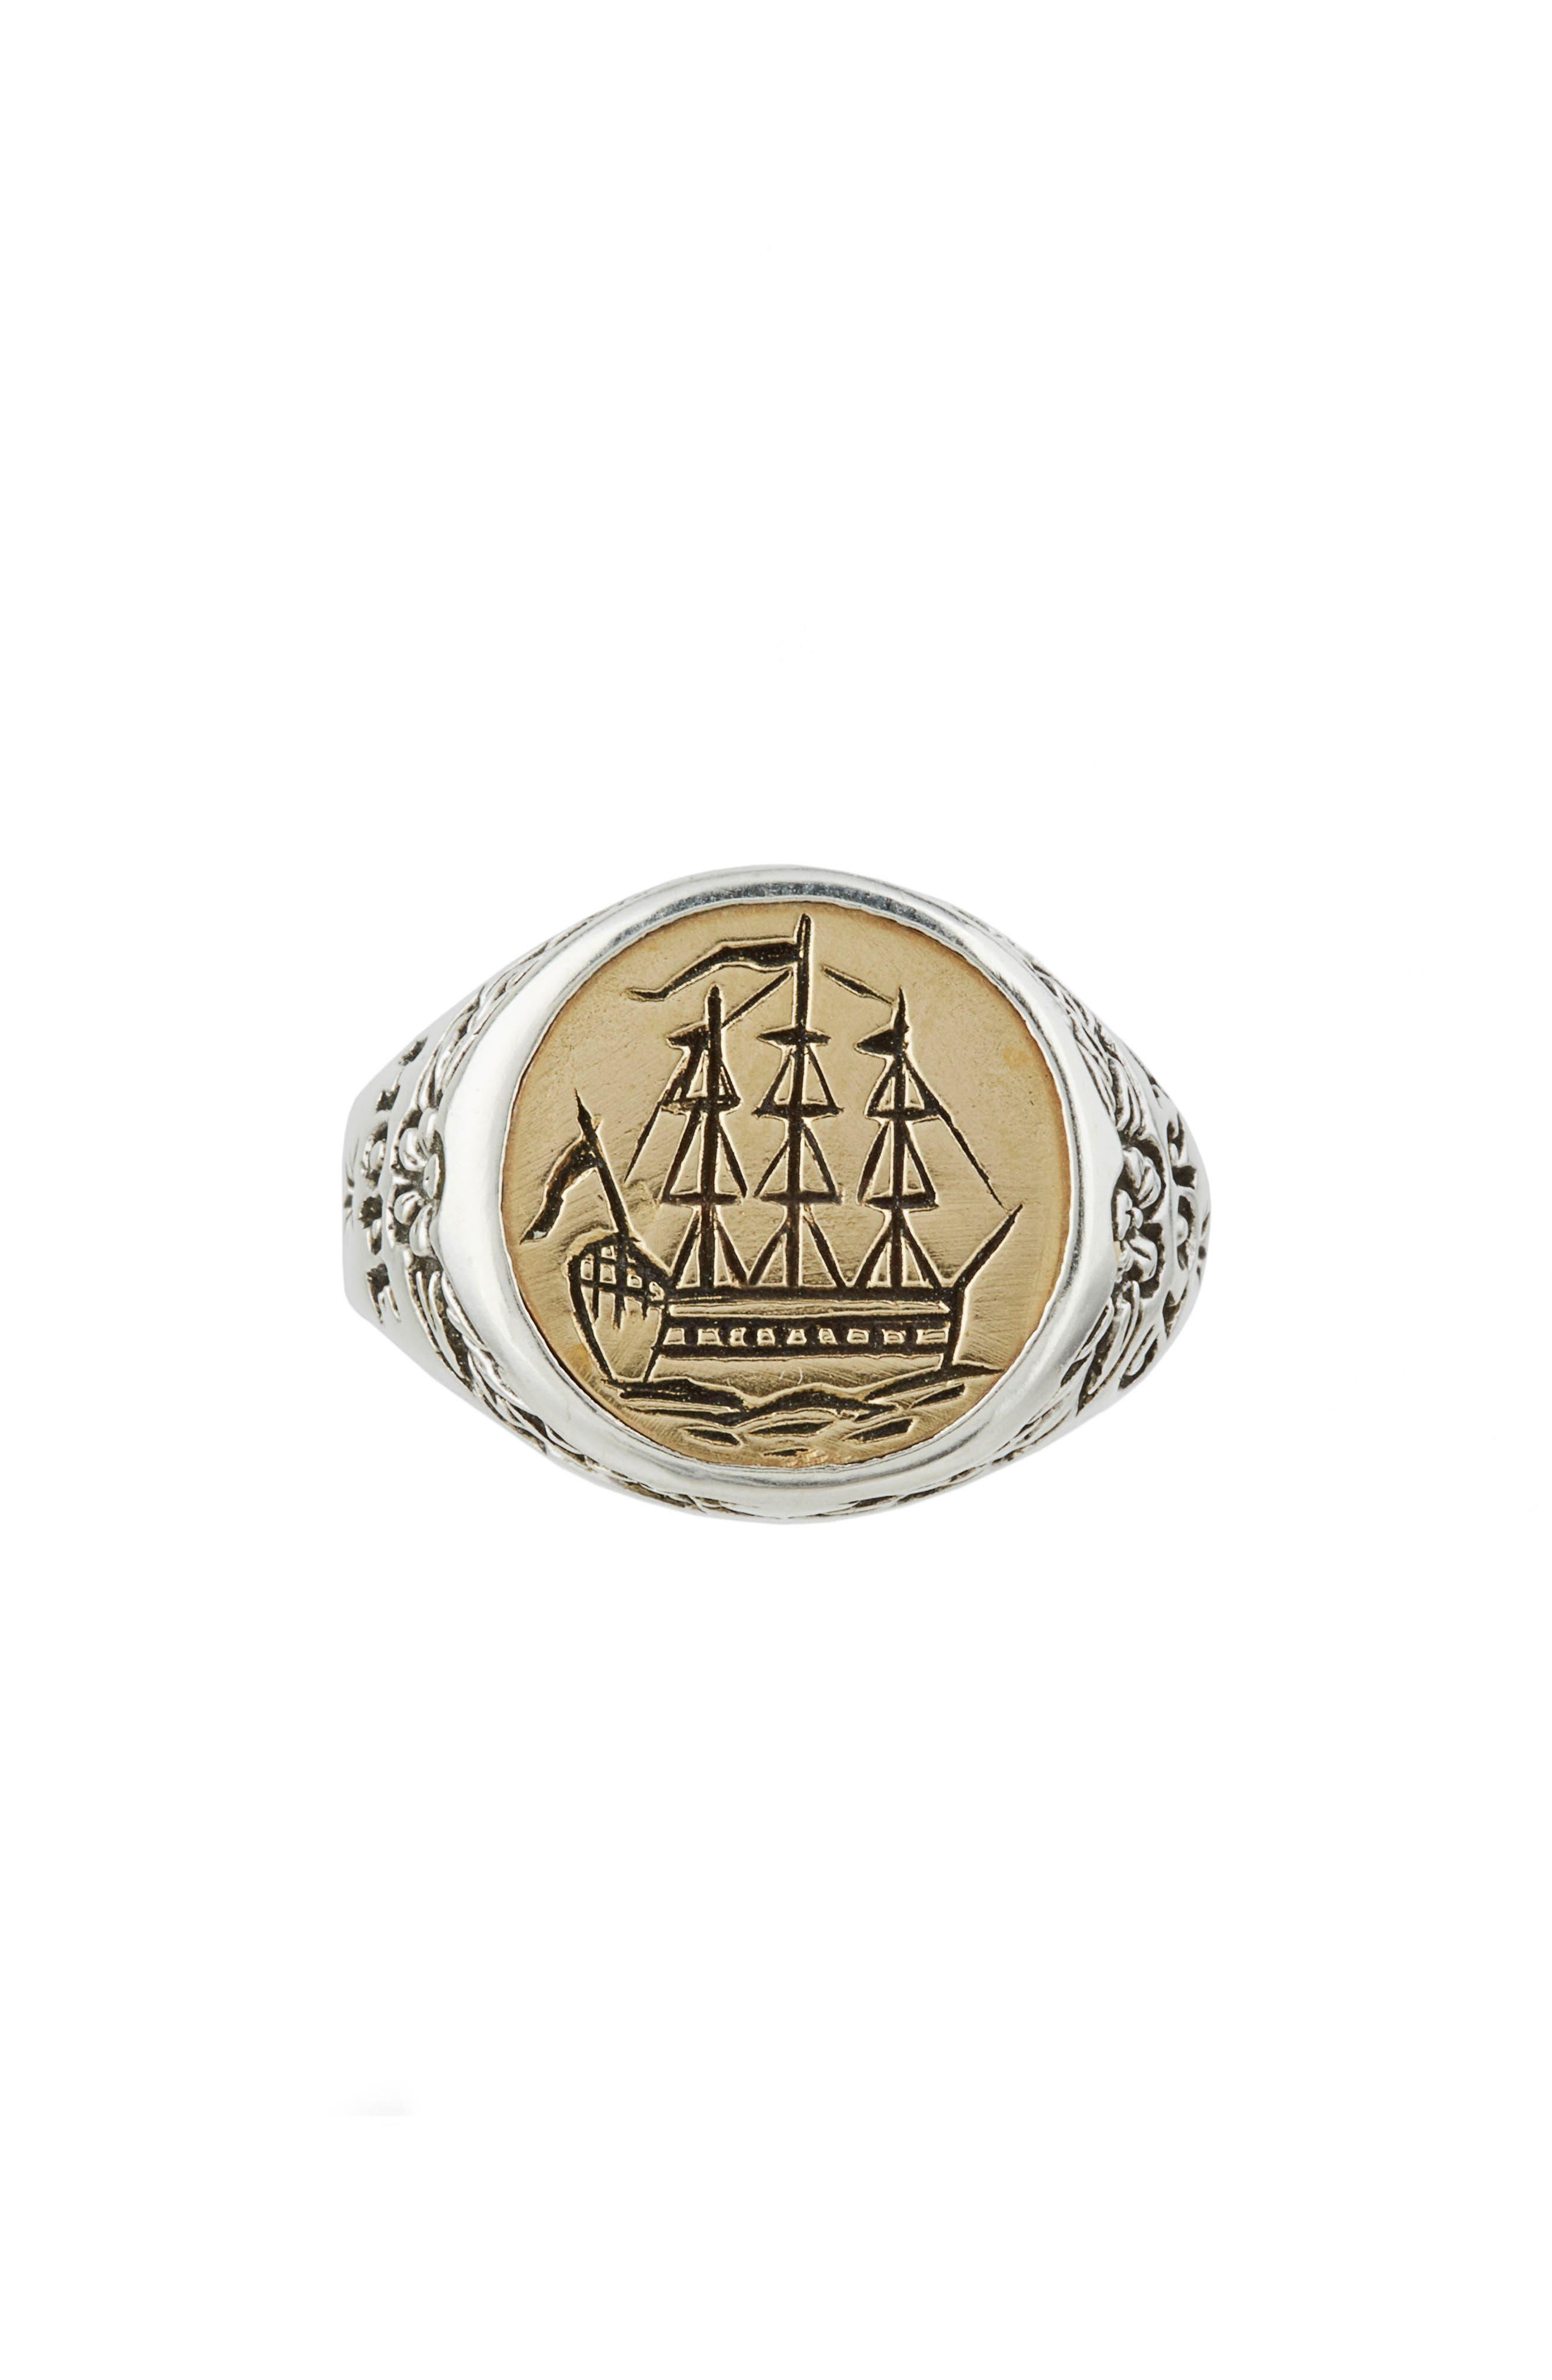 Main Image - Lewis Henry Nicholas Albion Ring